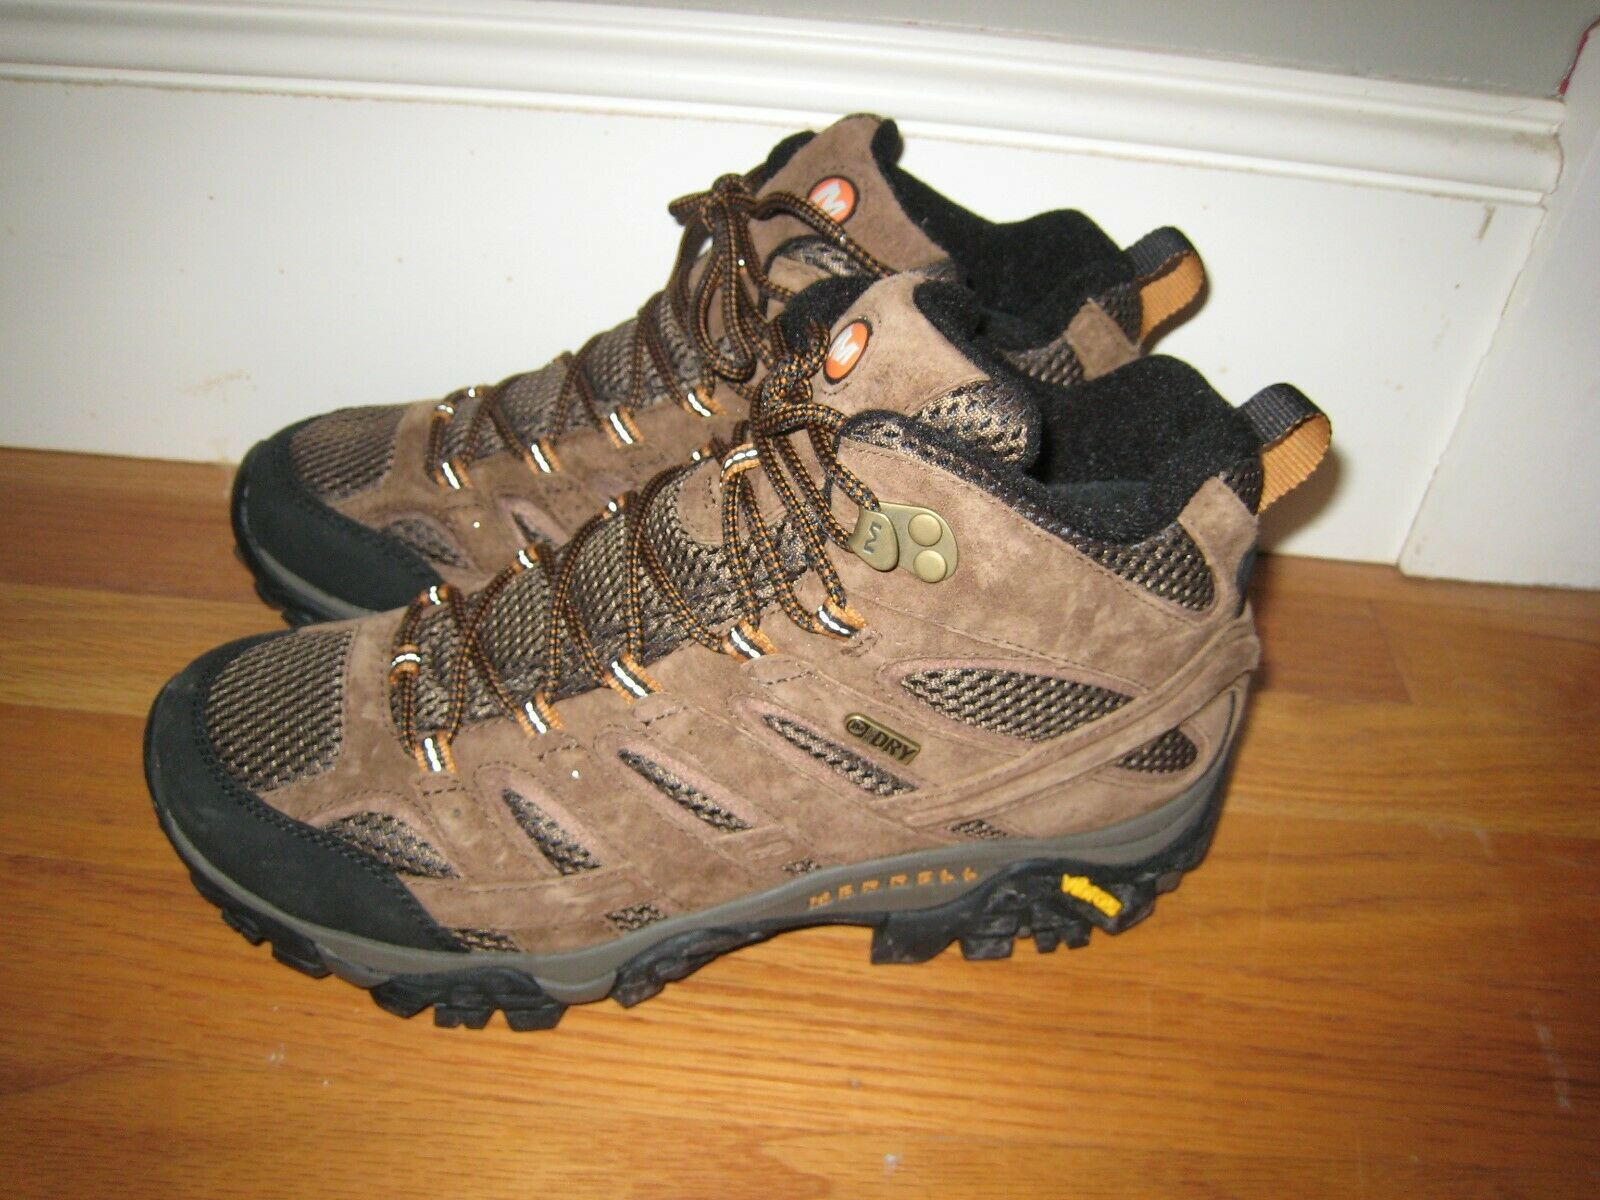 Merrell Moab 2 MID, caminante impermeable, 9 yardas, nuevo.